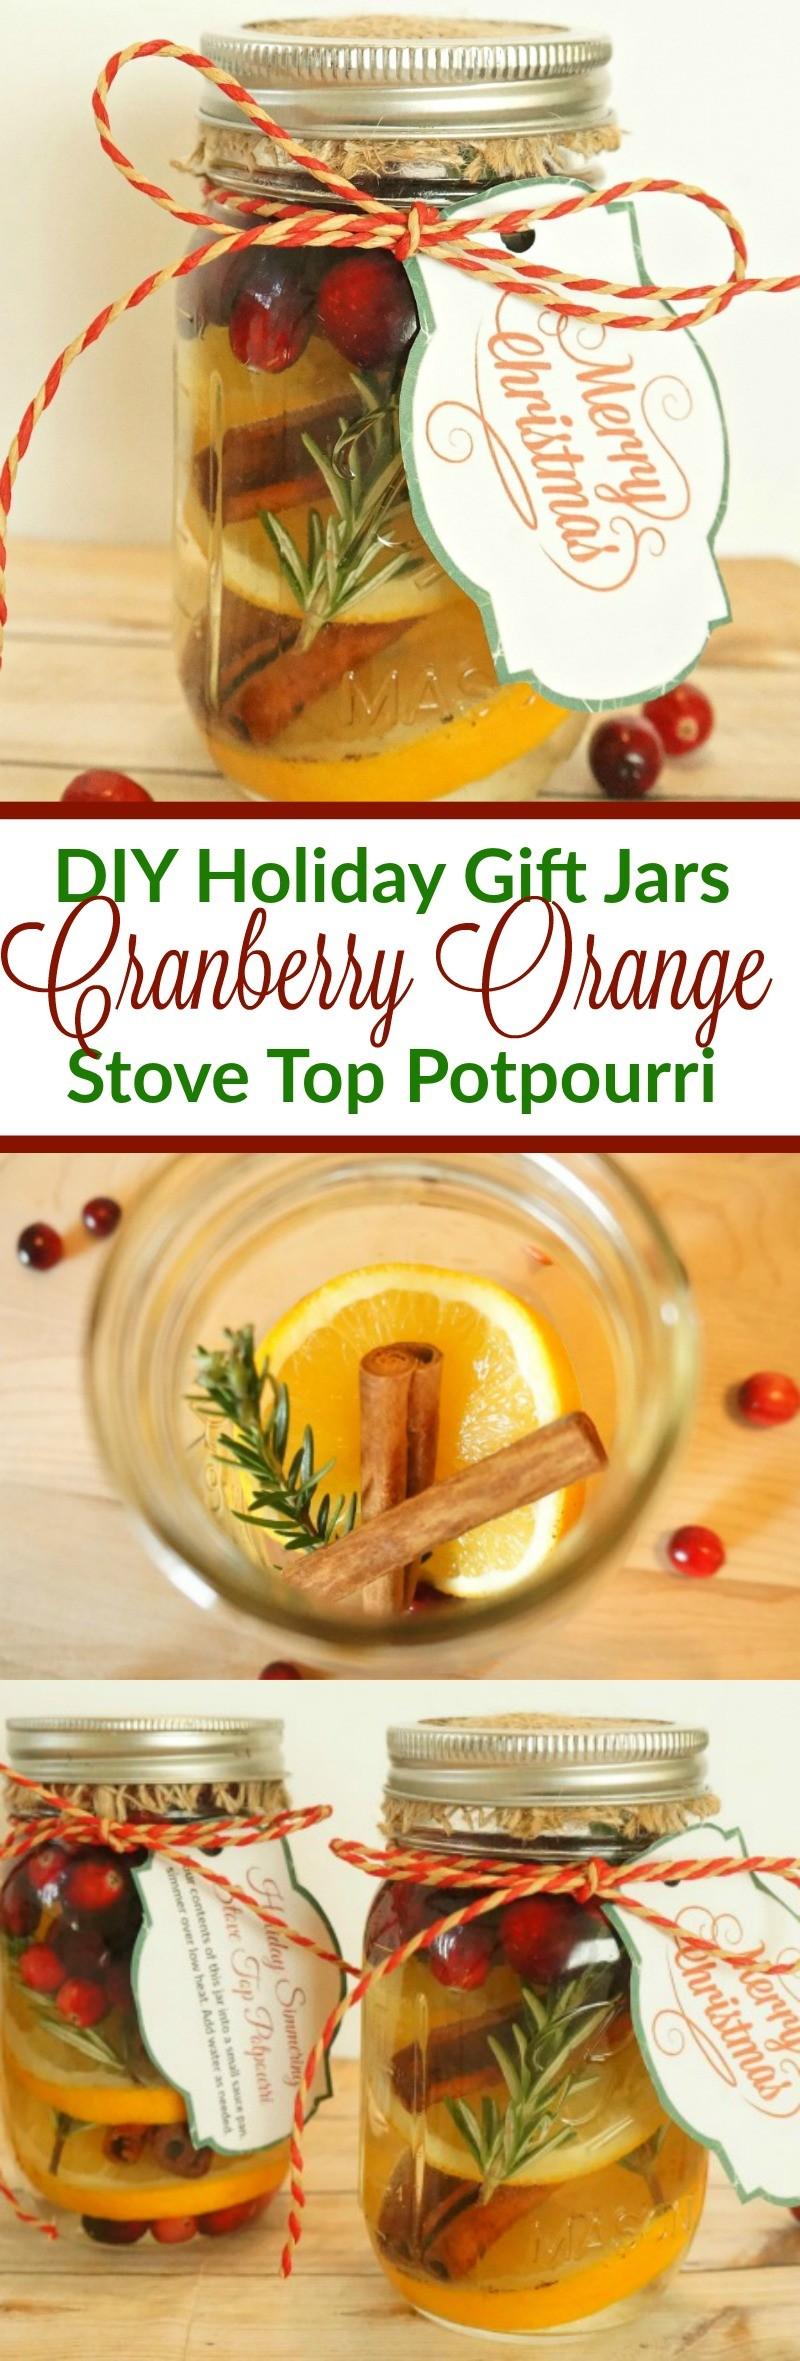 DIY Holiday Gift Mason Jars - How To Make Cranberry Orange Stove Top Potpourri